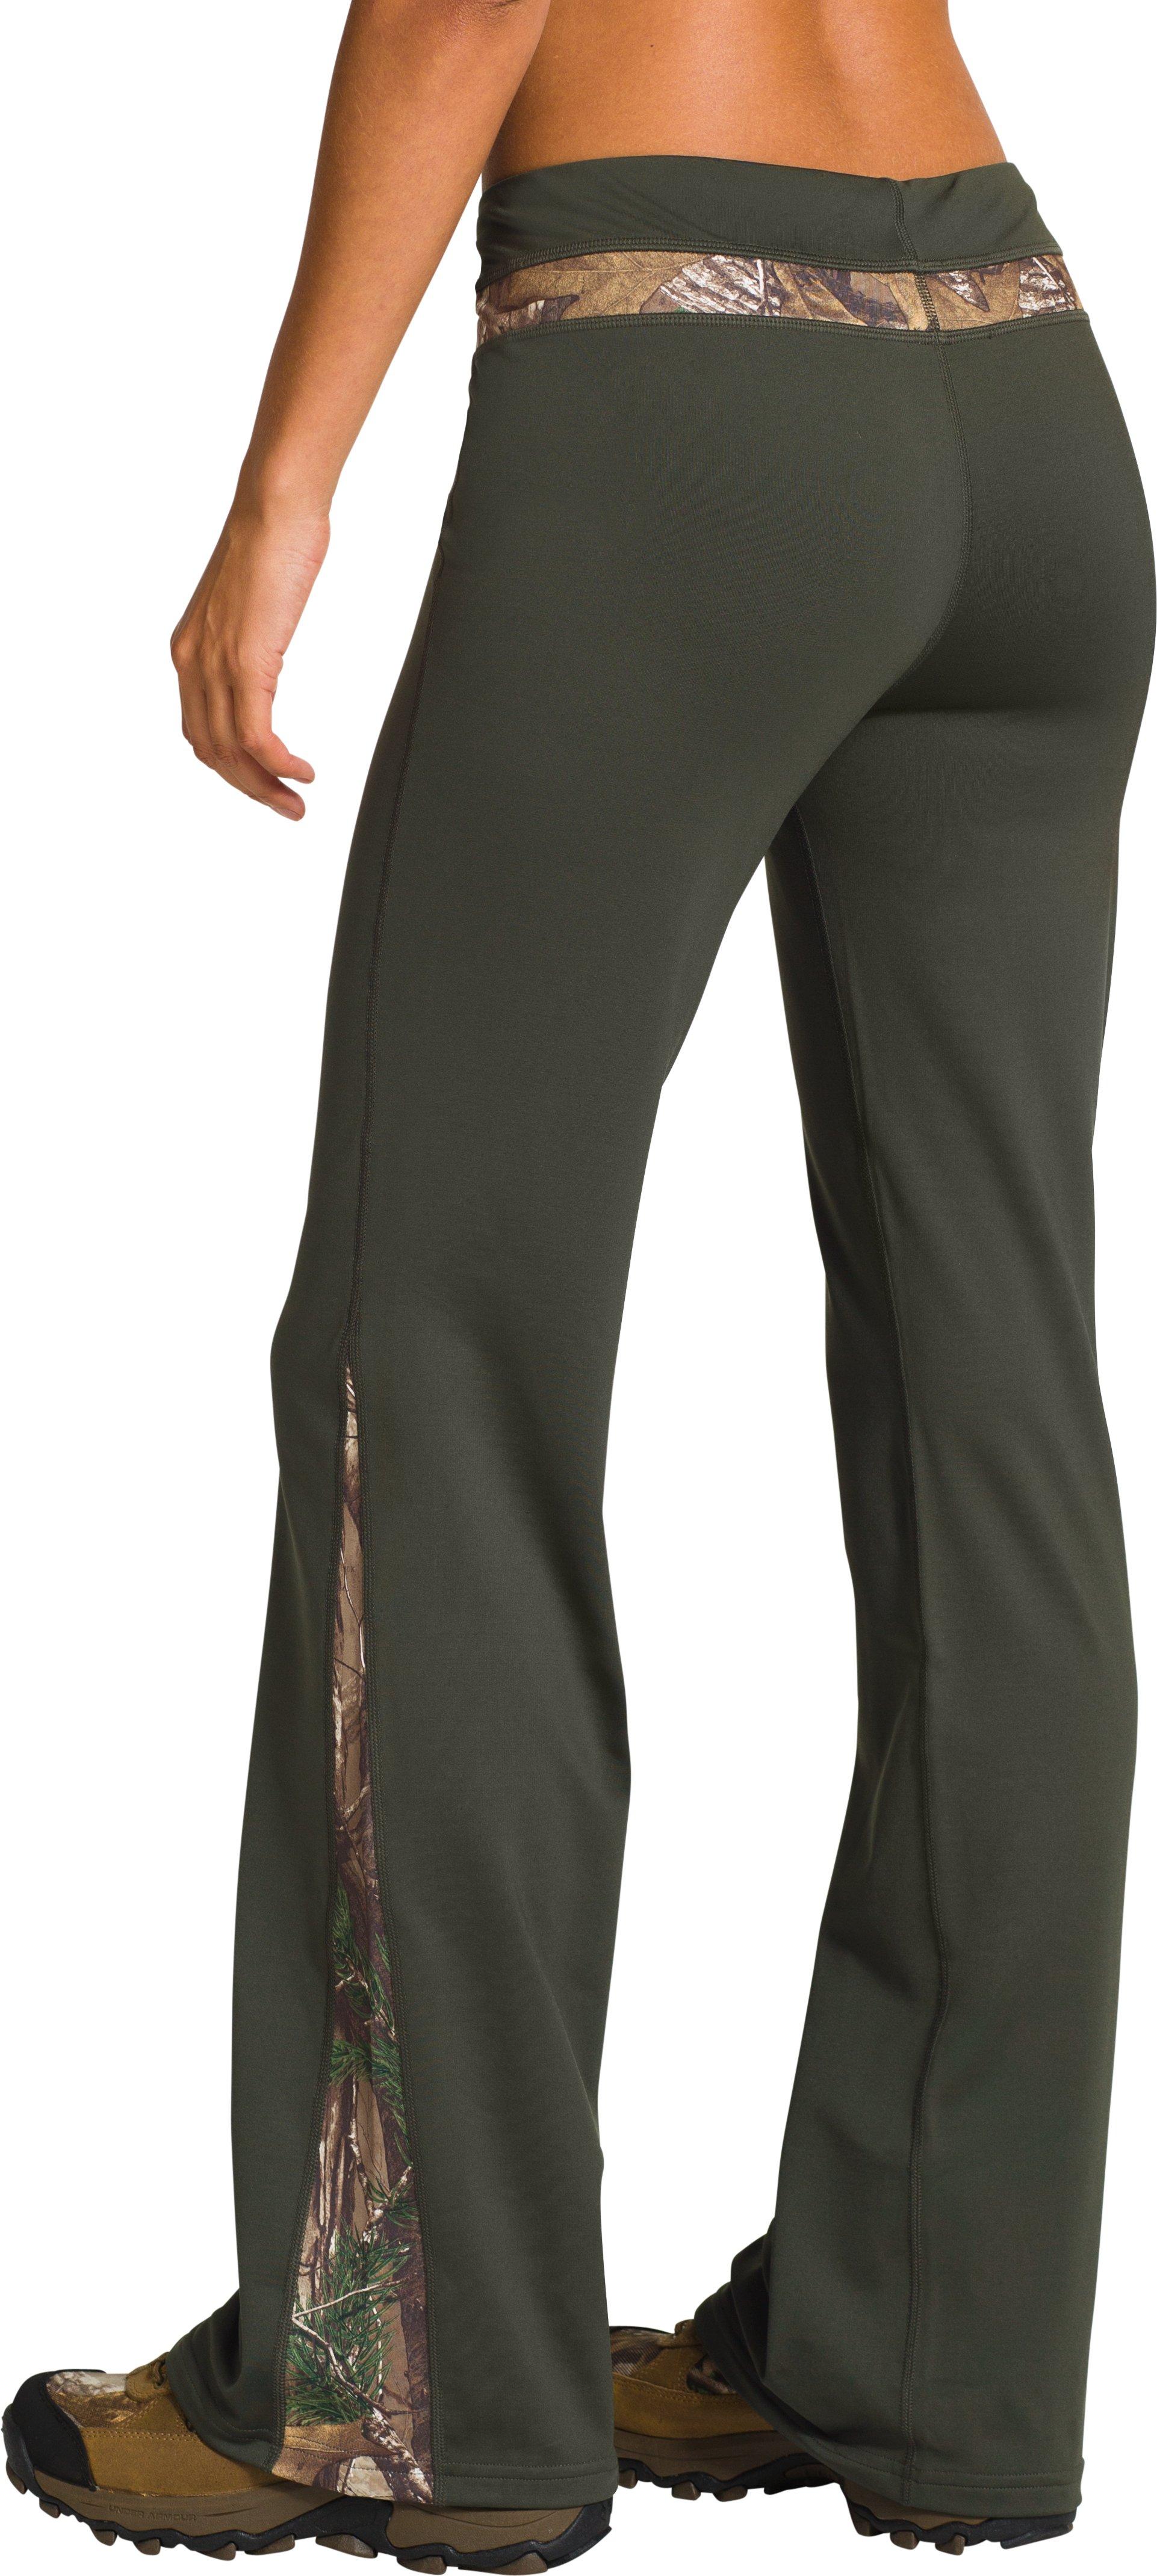 Lastest  Camouflage Pants Leggings Size L Color Camouflage Material 100